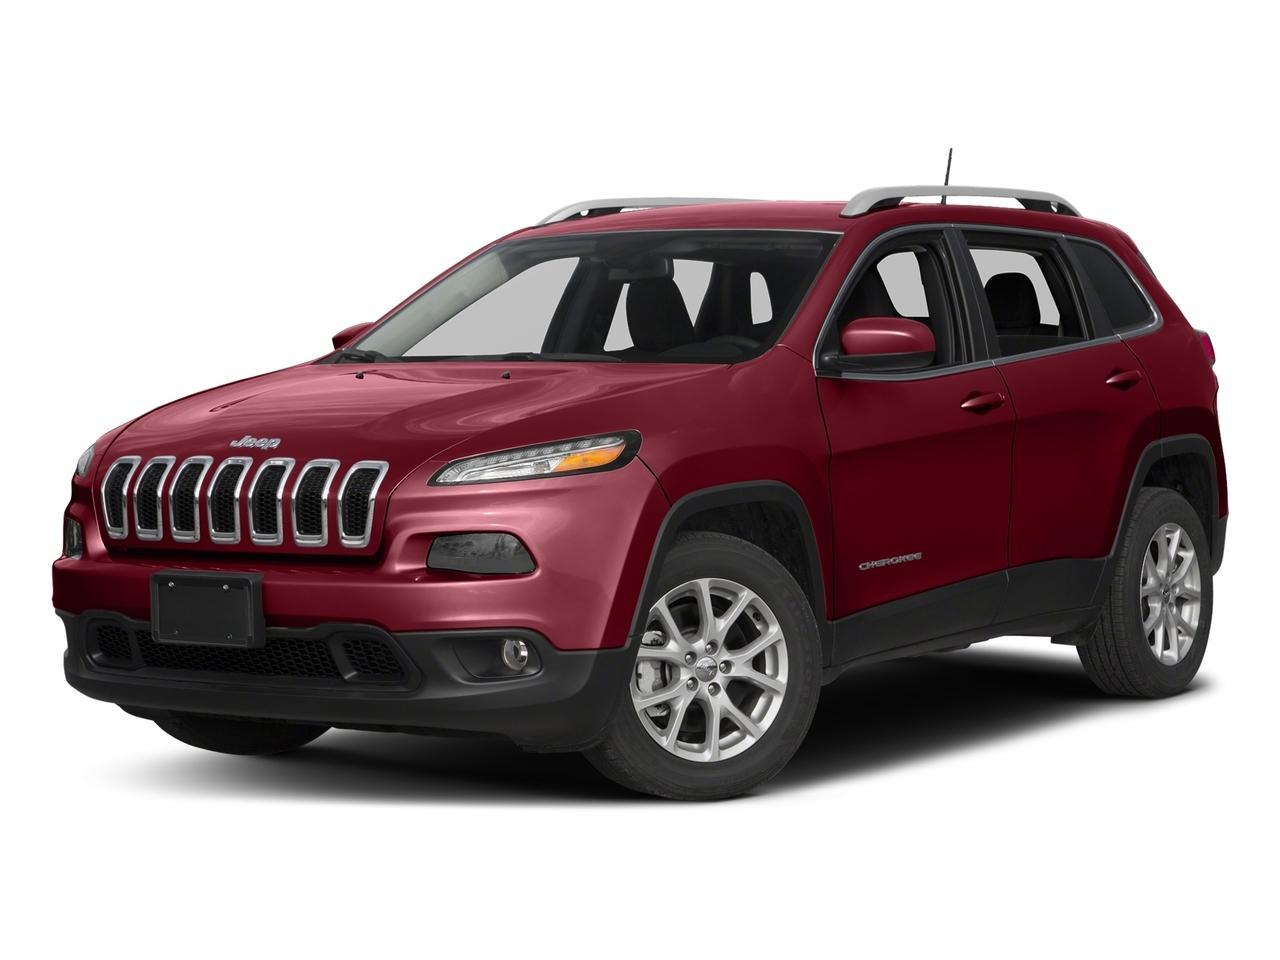 2017 Jeep Cherokee Vehicle Photo in Odessa, TX 79762